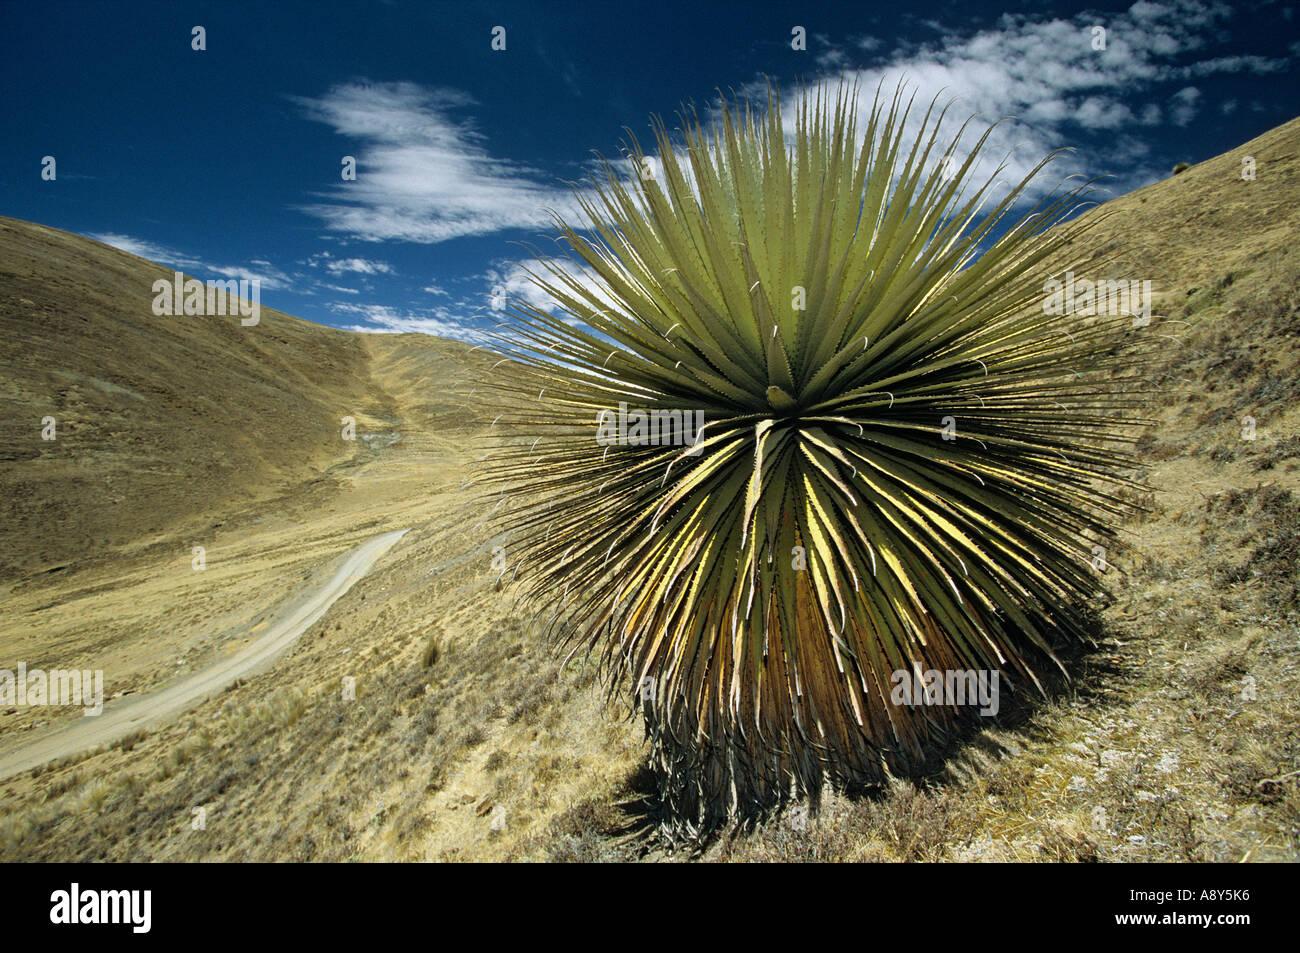 Puya Raimondi (Puya sp) on the site of Winchus (Peru). Puya Raimondi (Puya sp) sur le site de Winchus (Pérou). Stock Photo